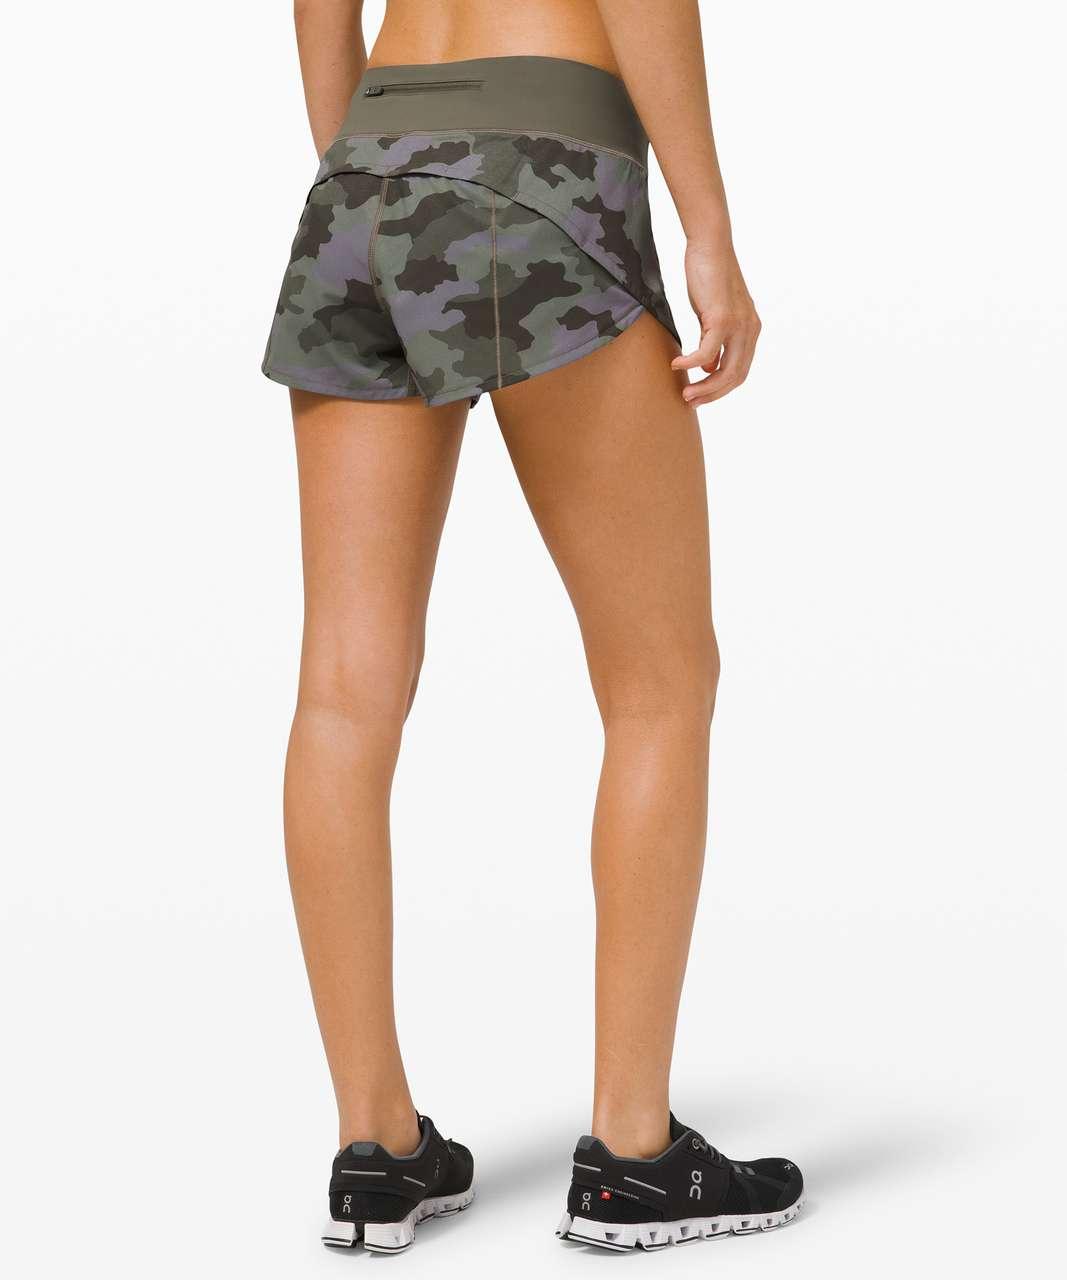 "Lululemon Speed Up Short *2.5"" - Heritage 365 Camo Dusky Lavender Multi / Army Green"